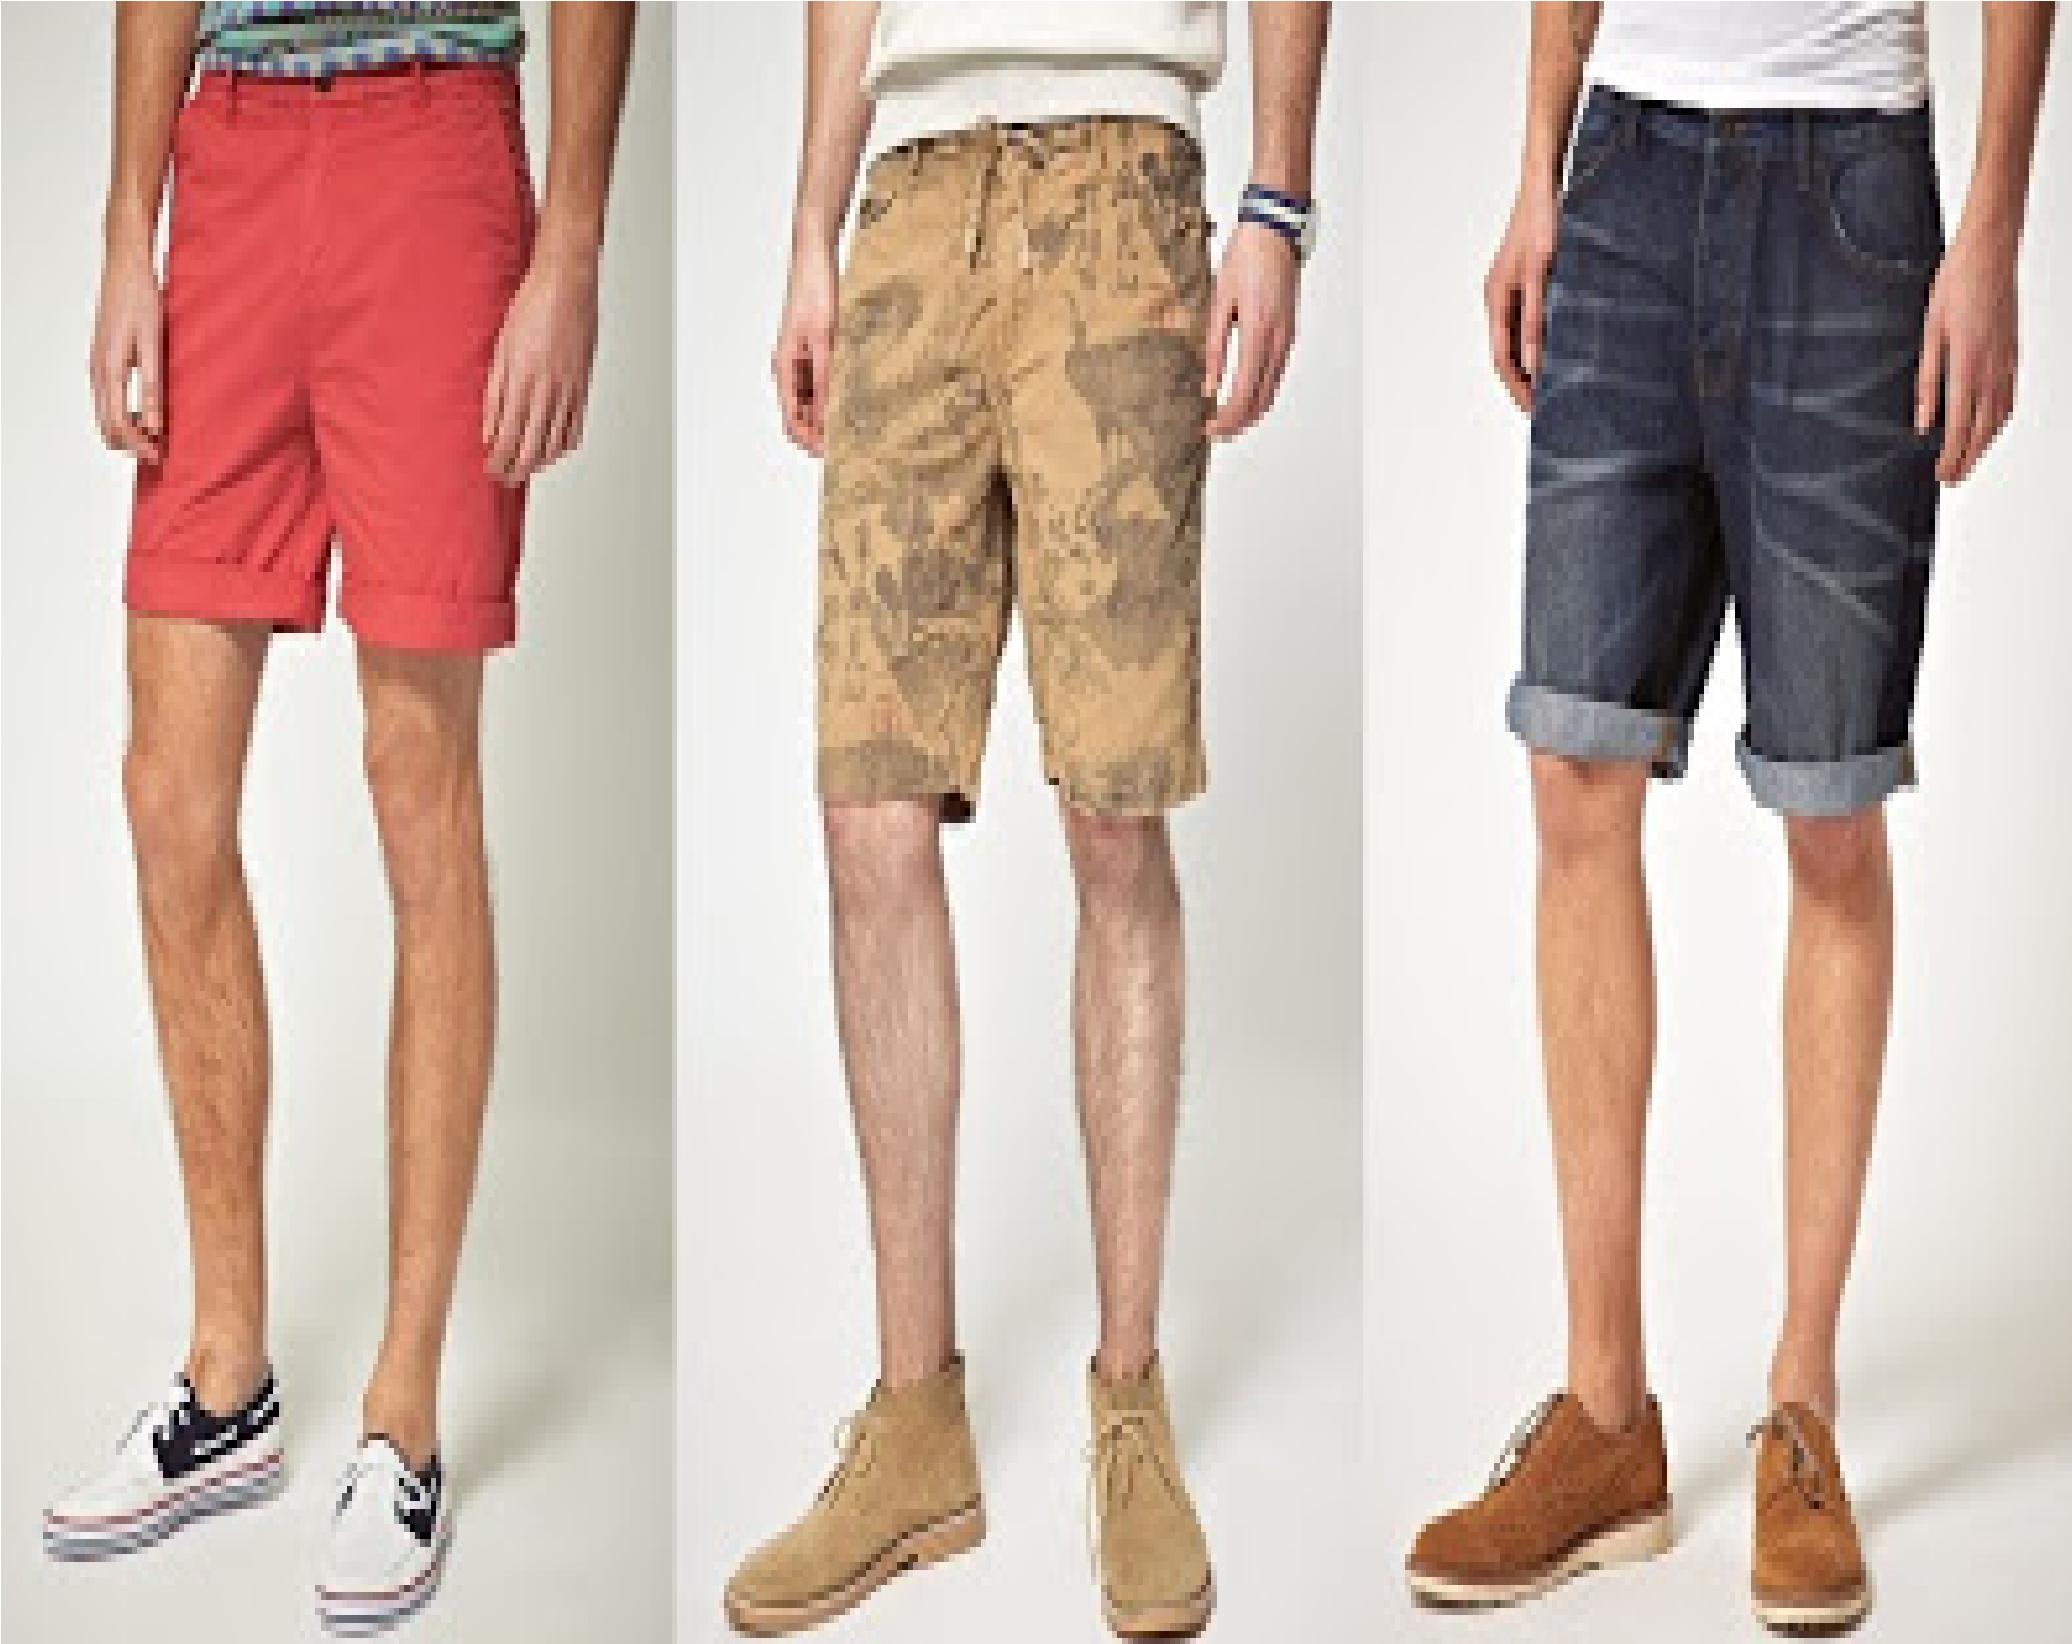 Tips de shorts para hombres distintas alternativas de